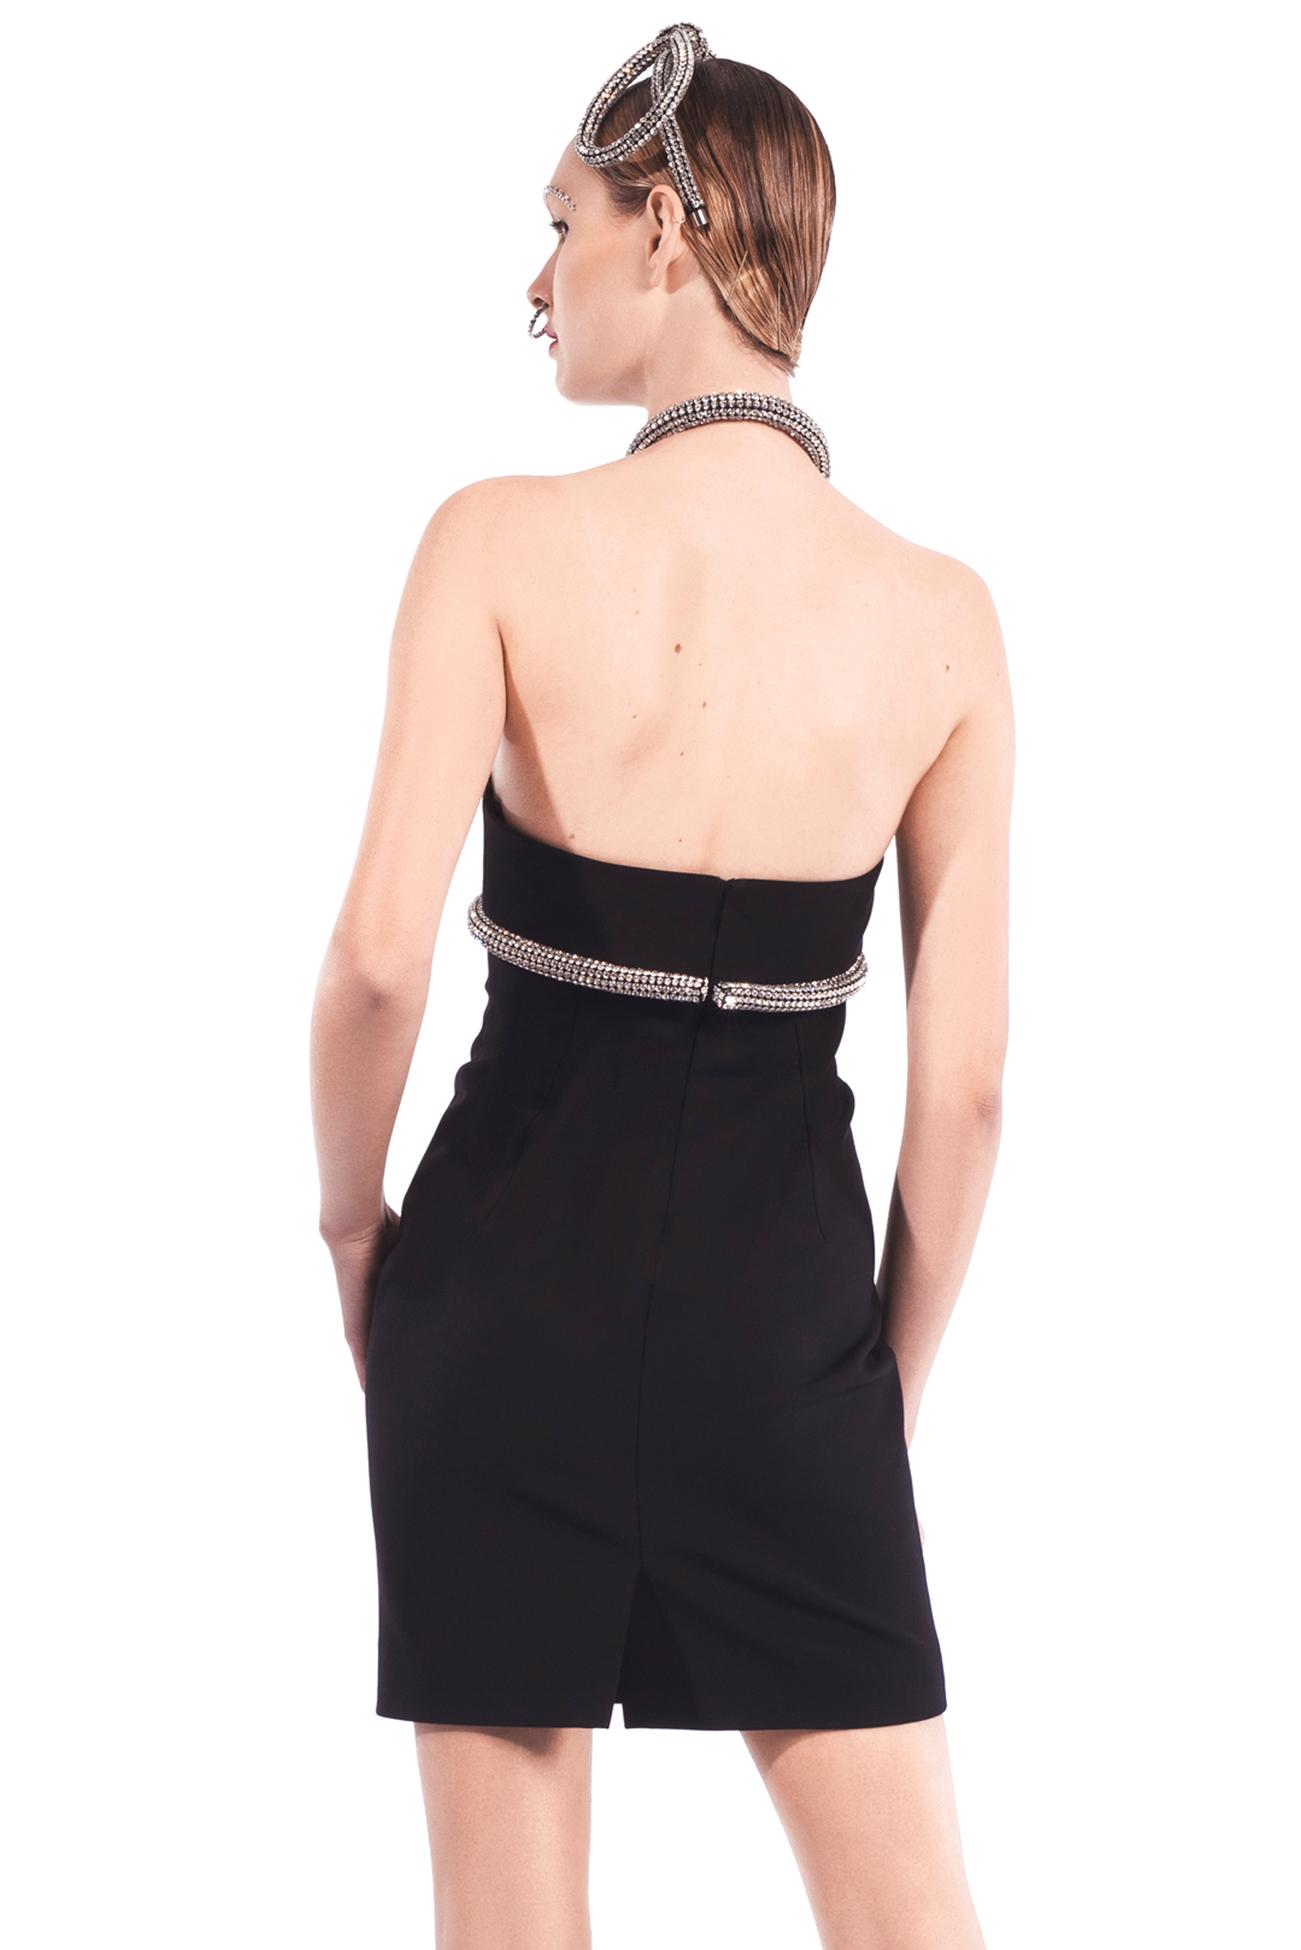 Crystal Rope Halter Dress